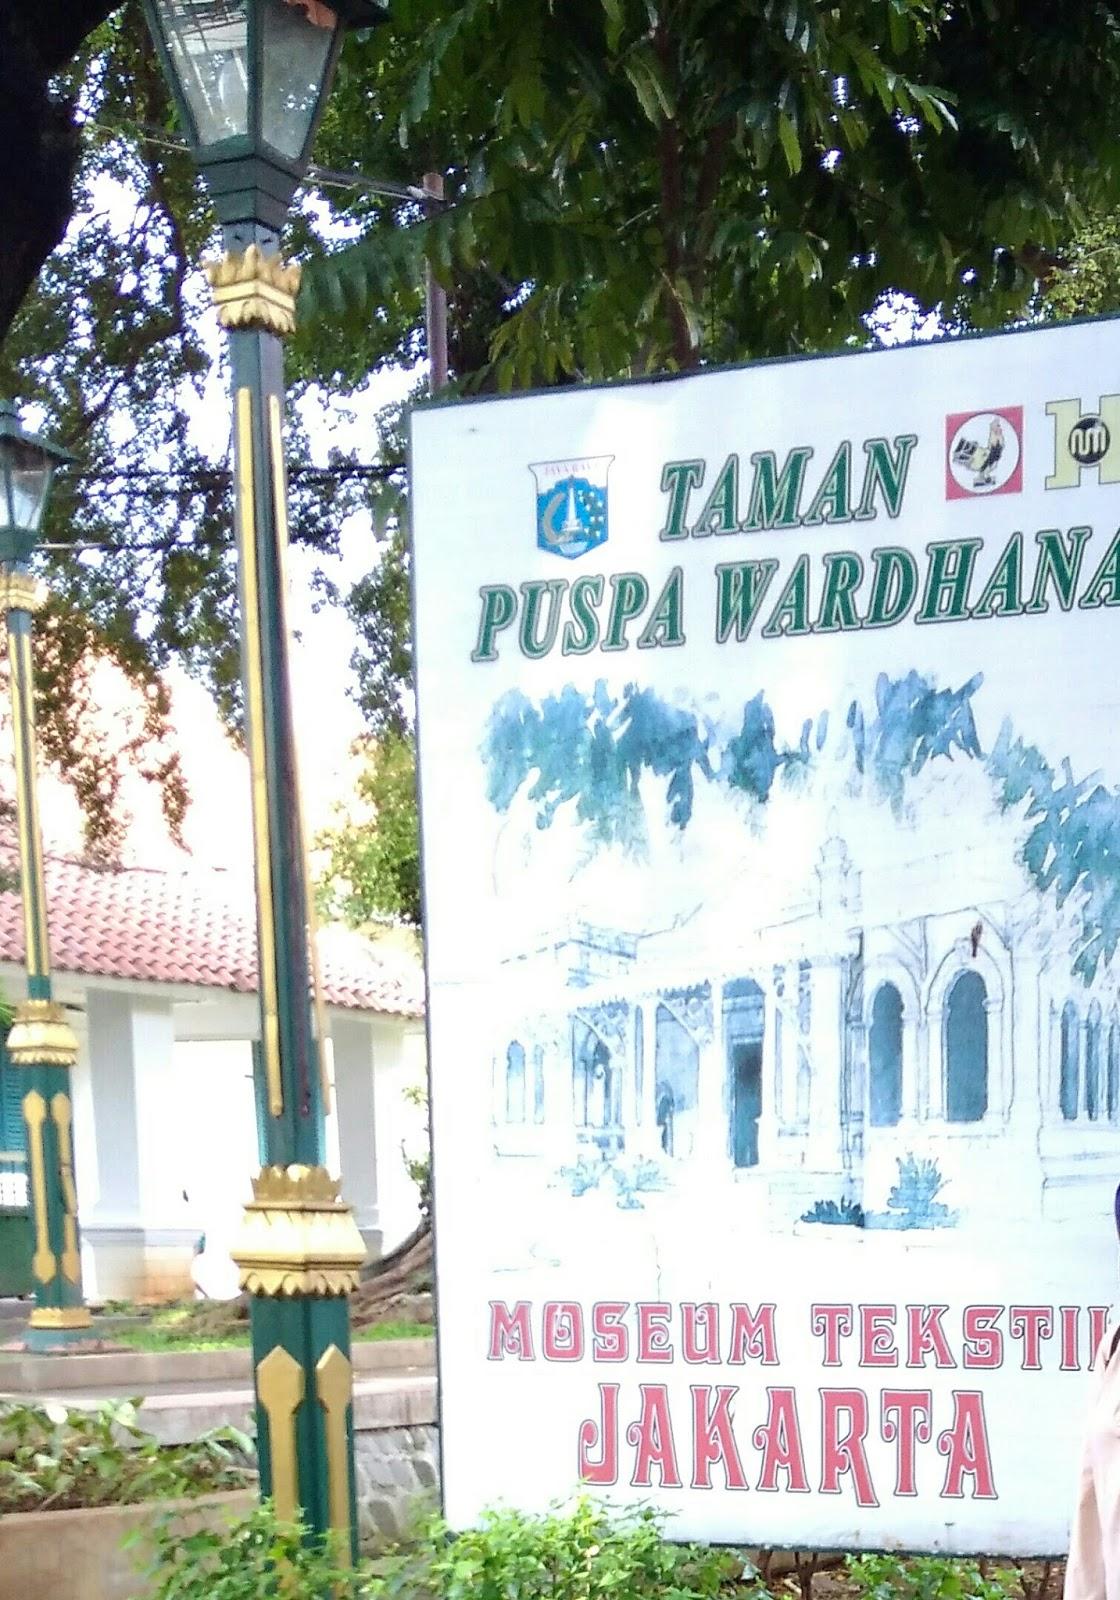 Wisata Belanja Demo Masak Bersama Kriya Indonesia Honestbee Senang Bisa